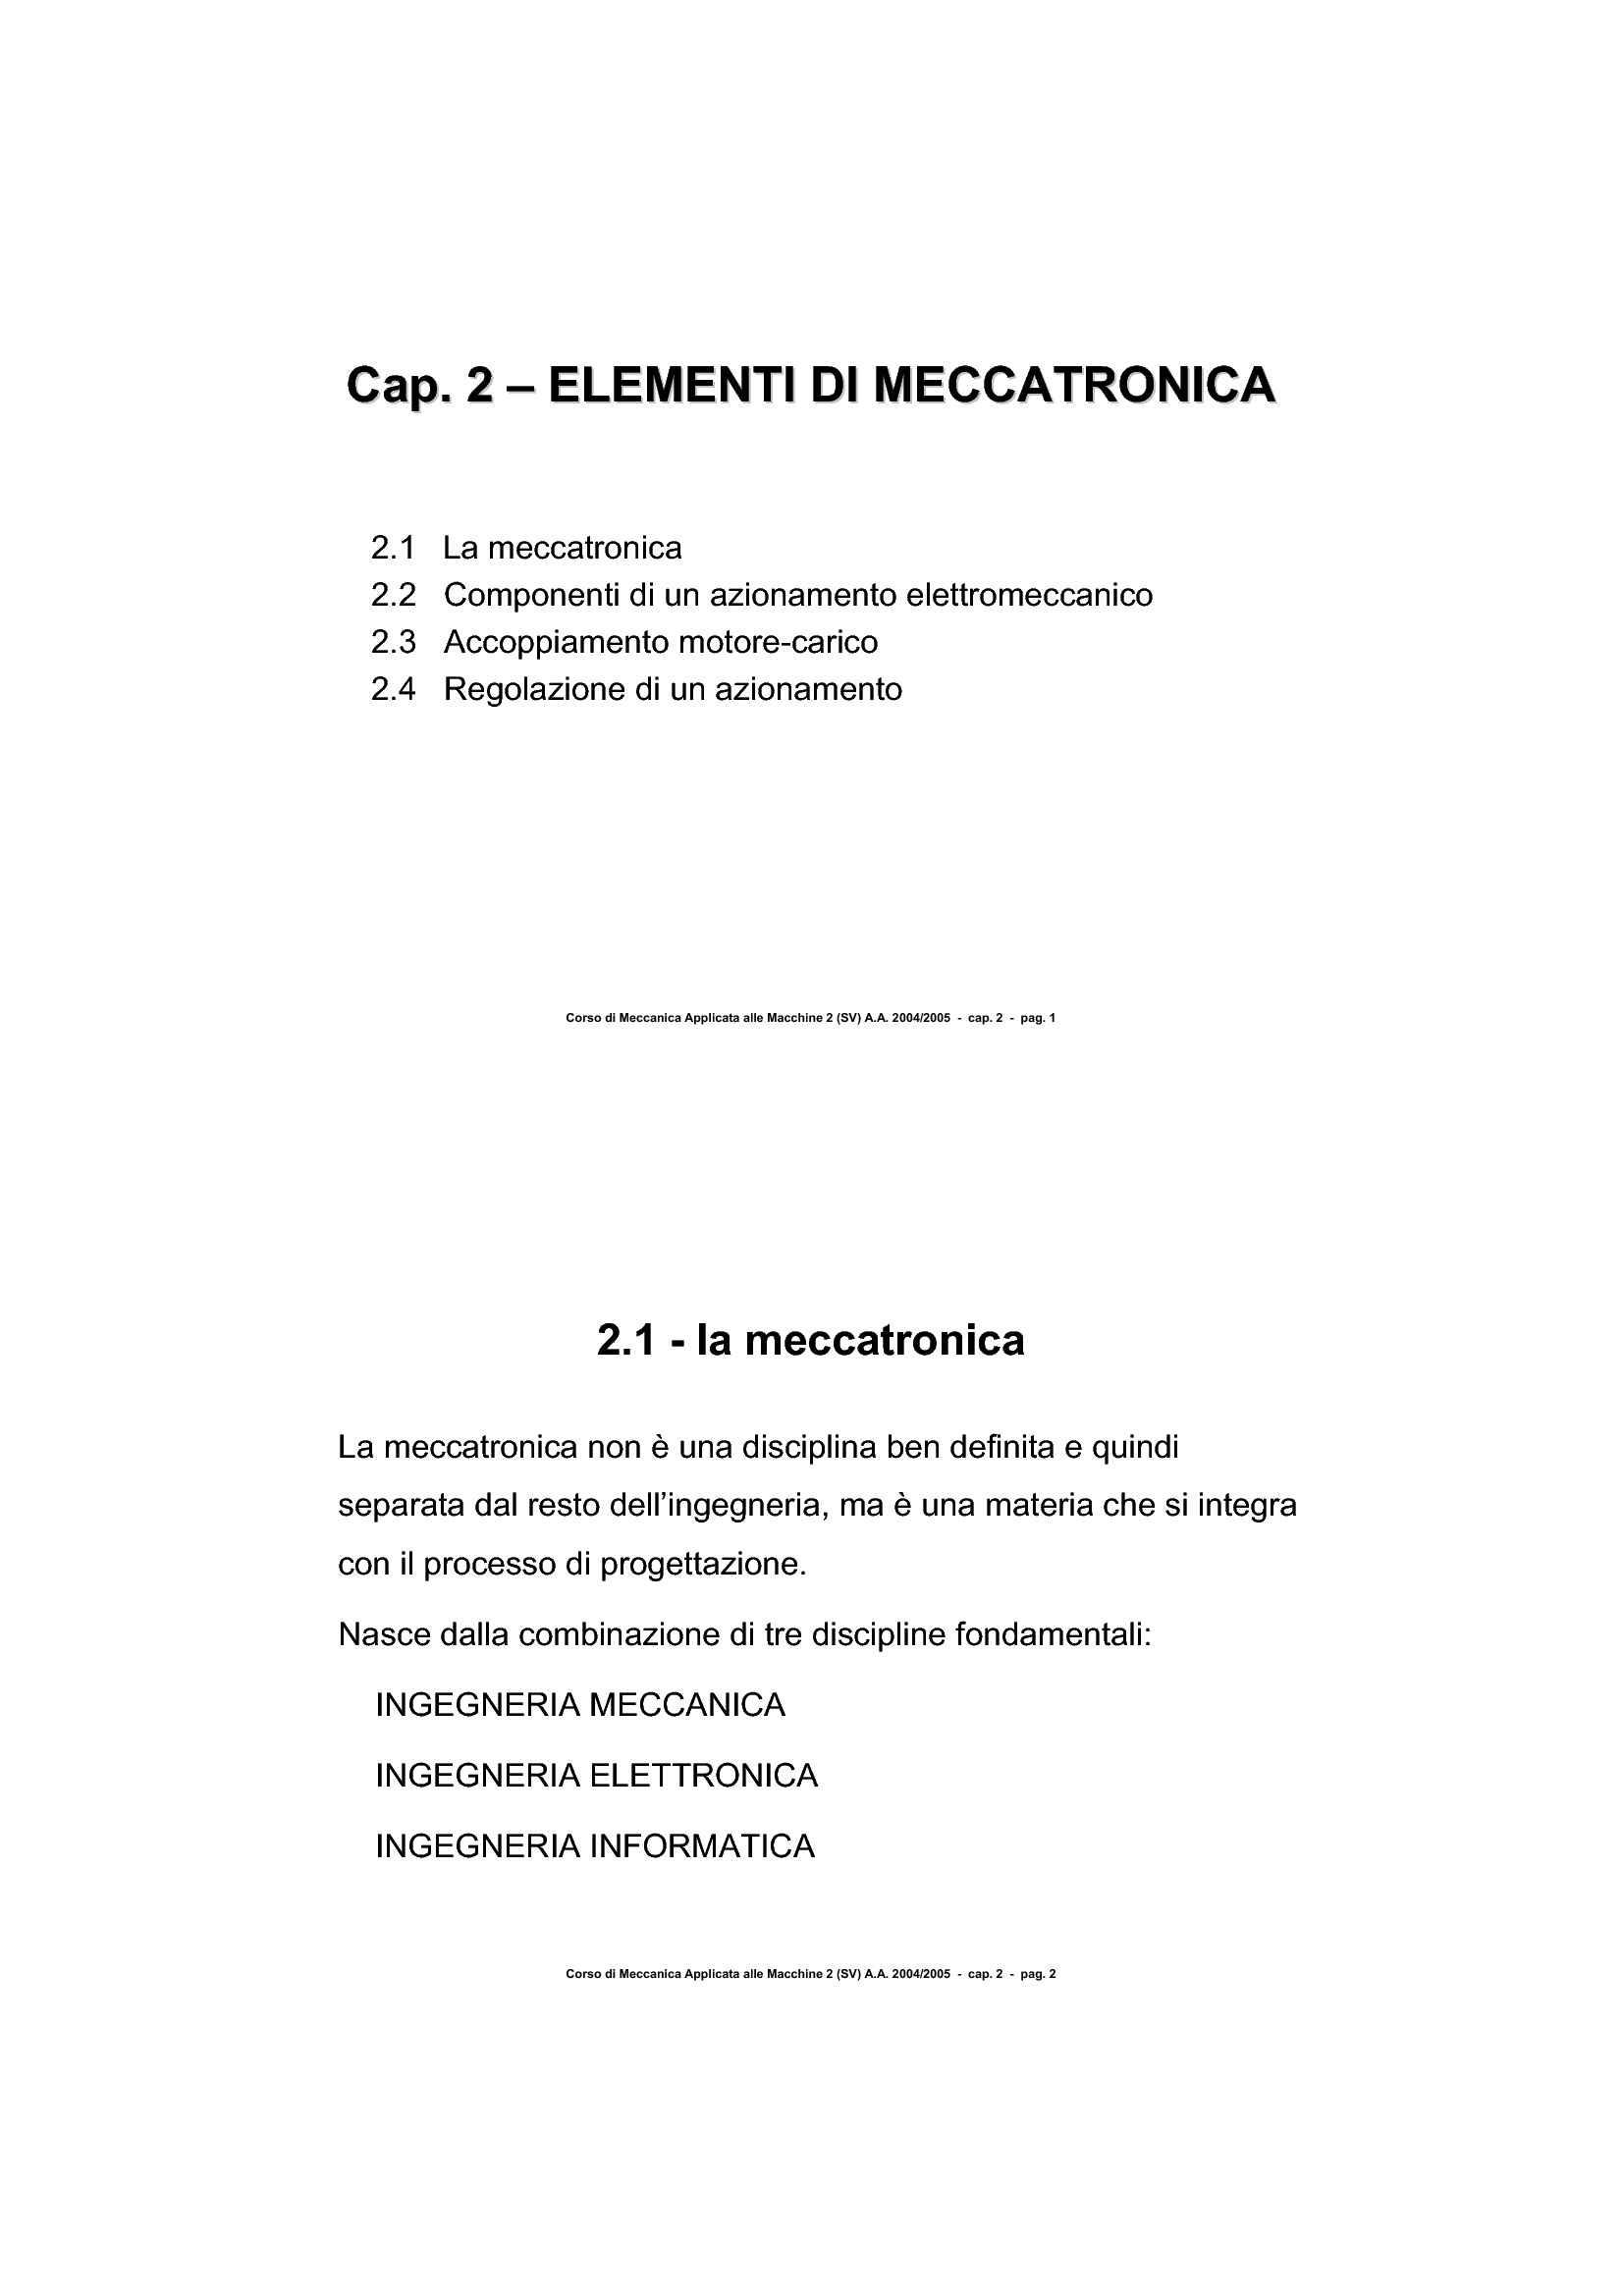 Maccanotronica - Elementi